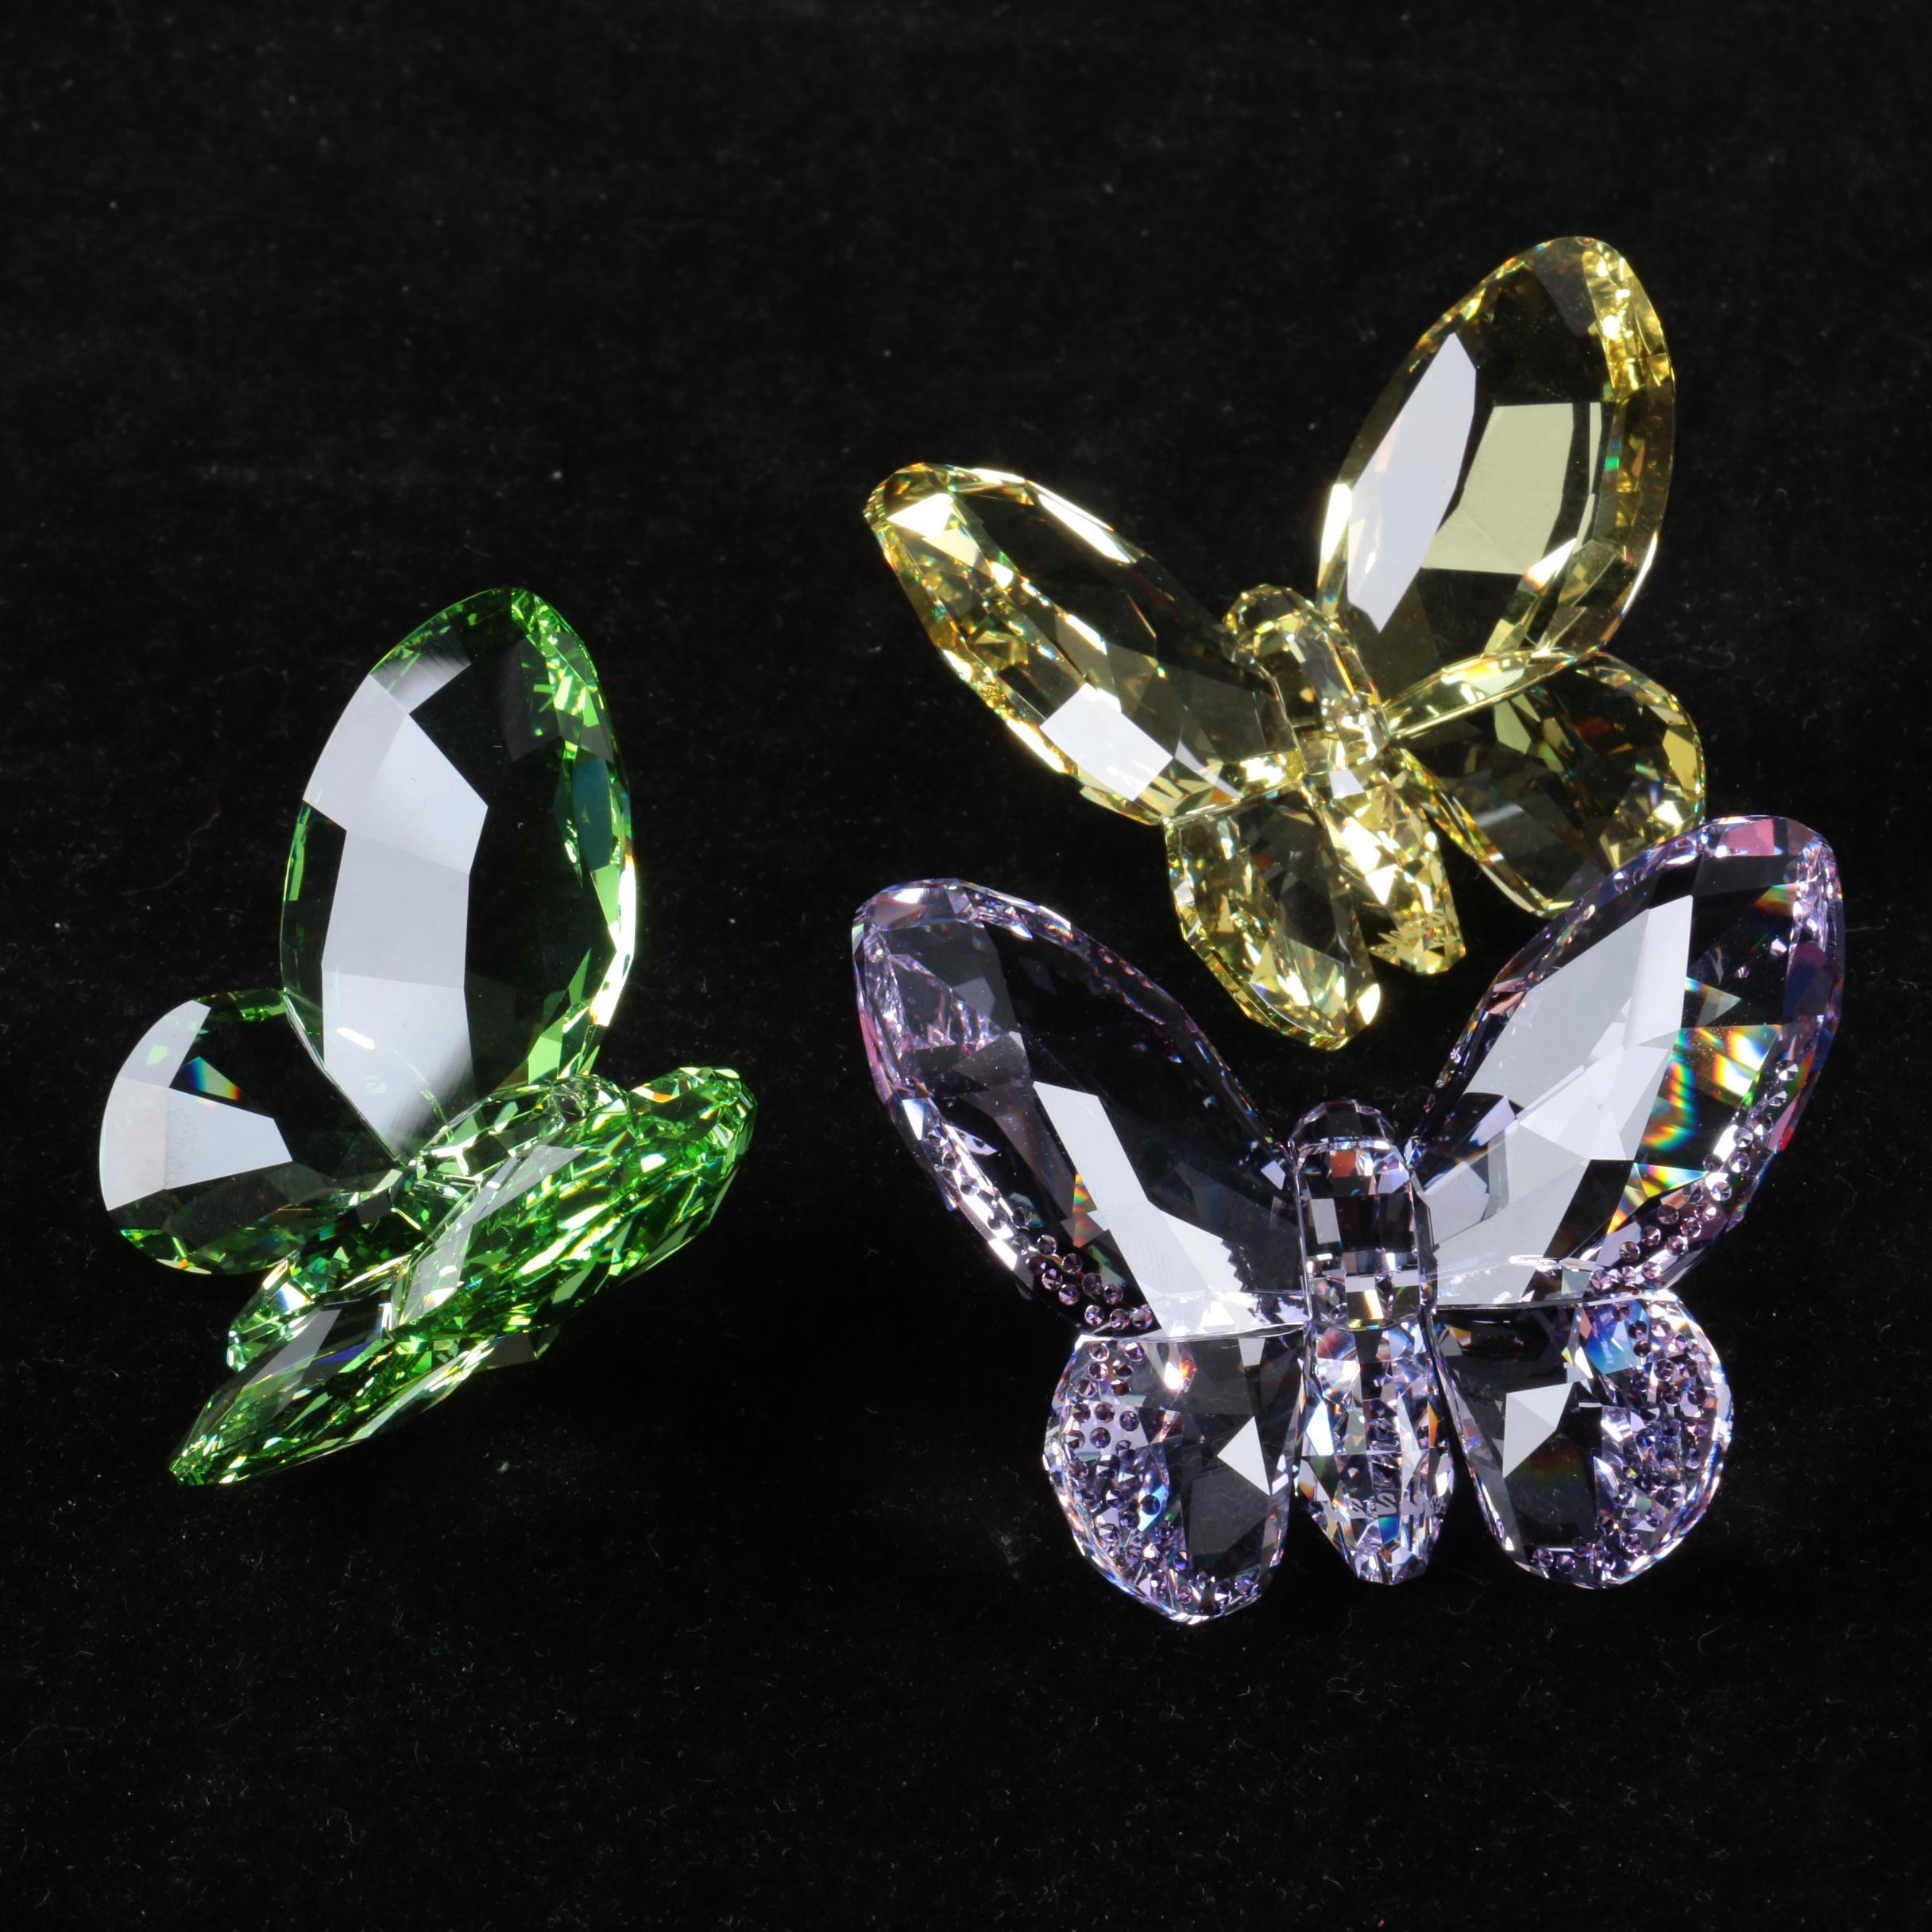 Swarovski Citrine, Amethyst, and Peridot Crystal Butterfly Figurines